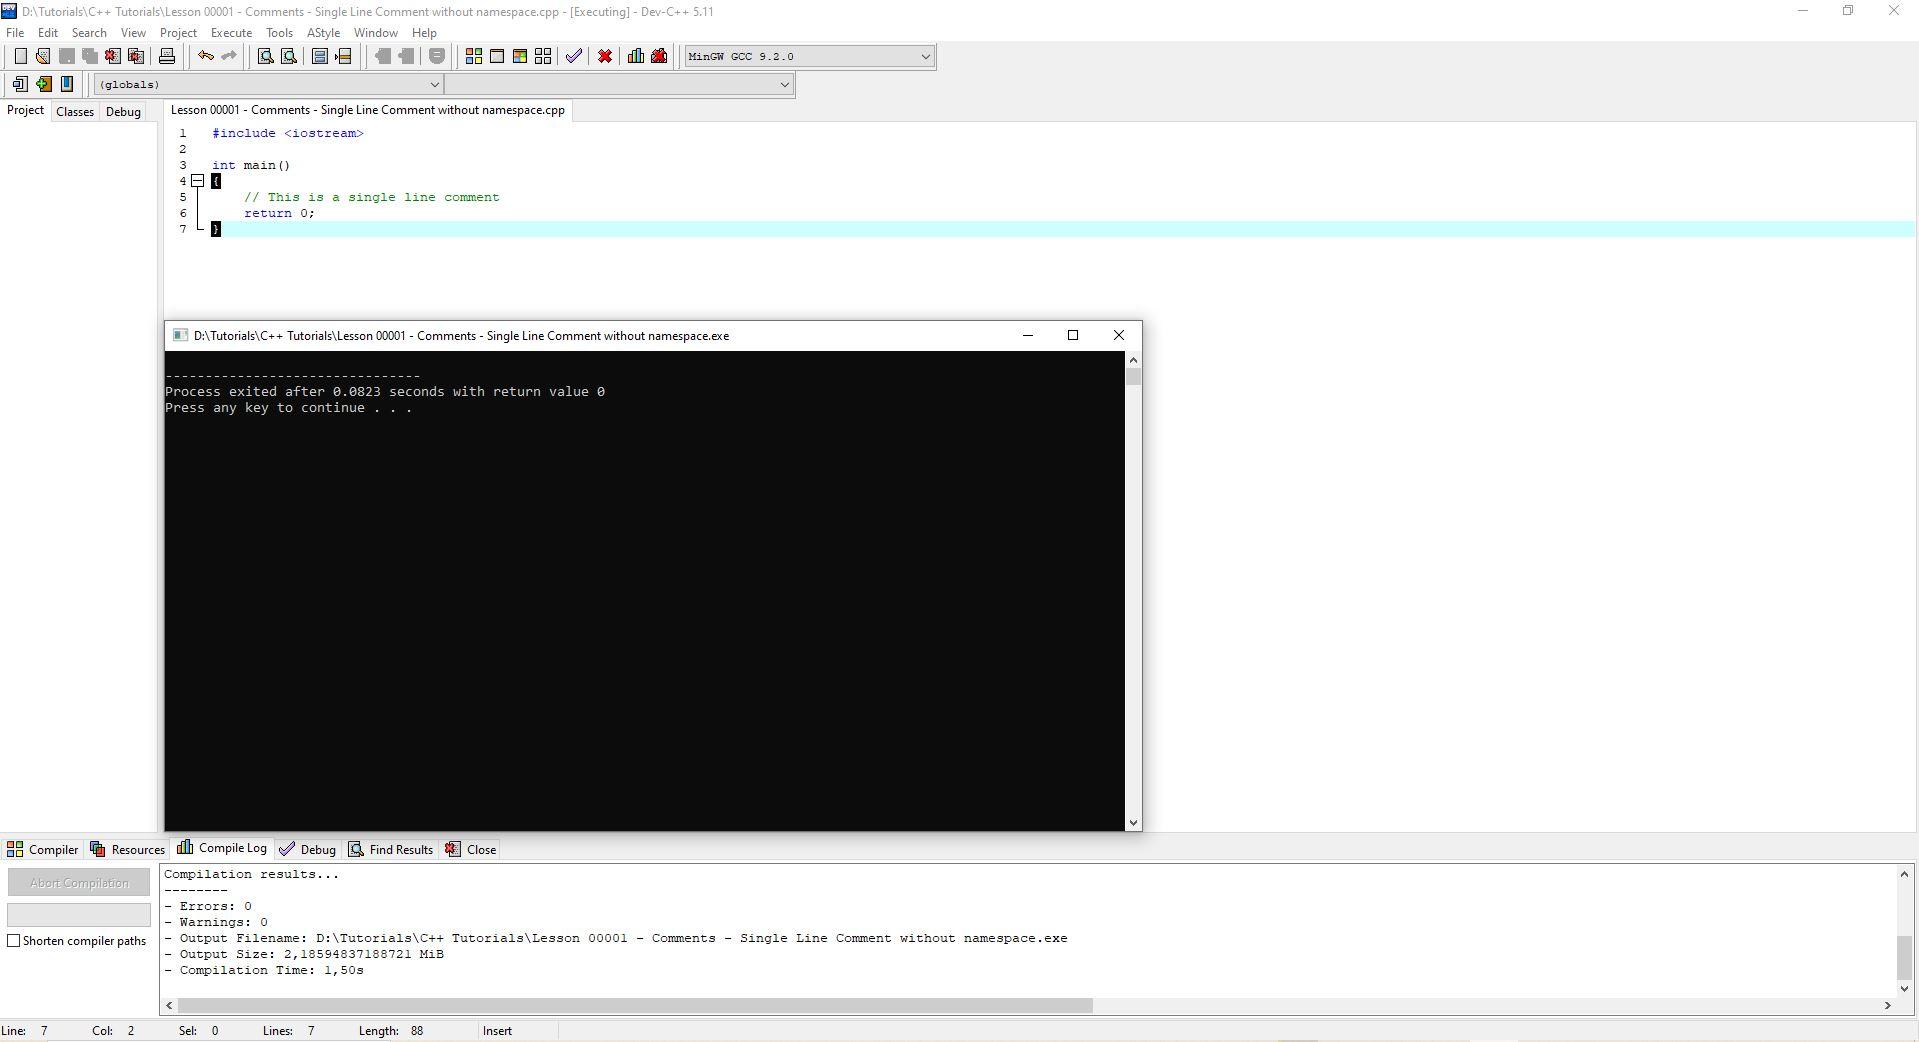 Lesson 0001 - Comments - Single Line Comment Without Namespace